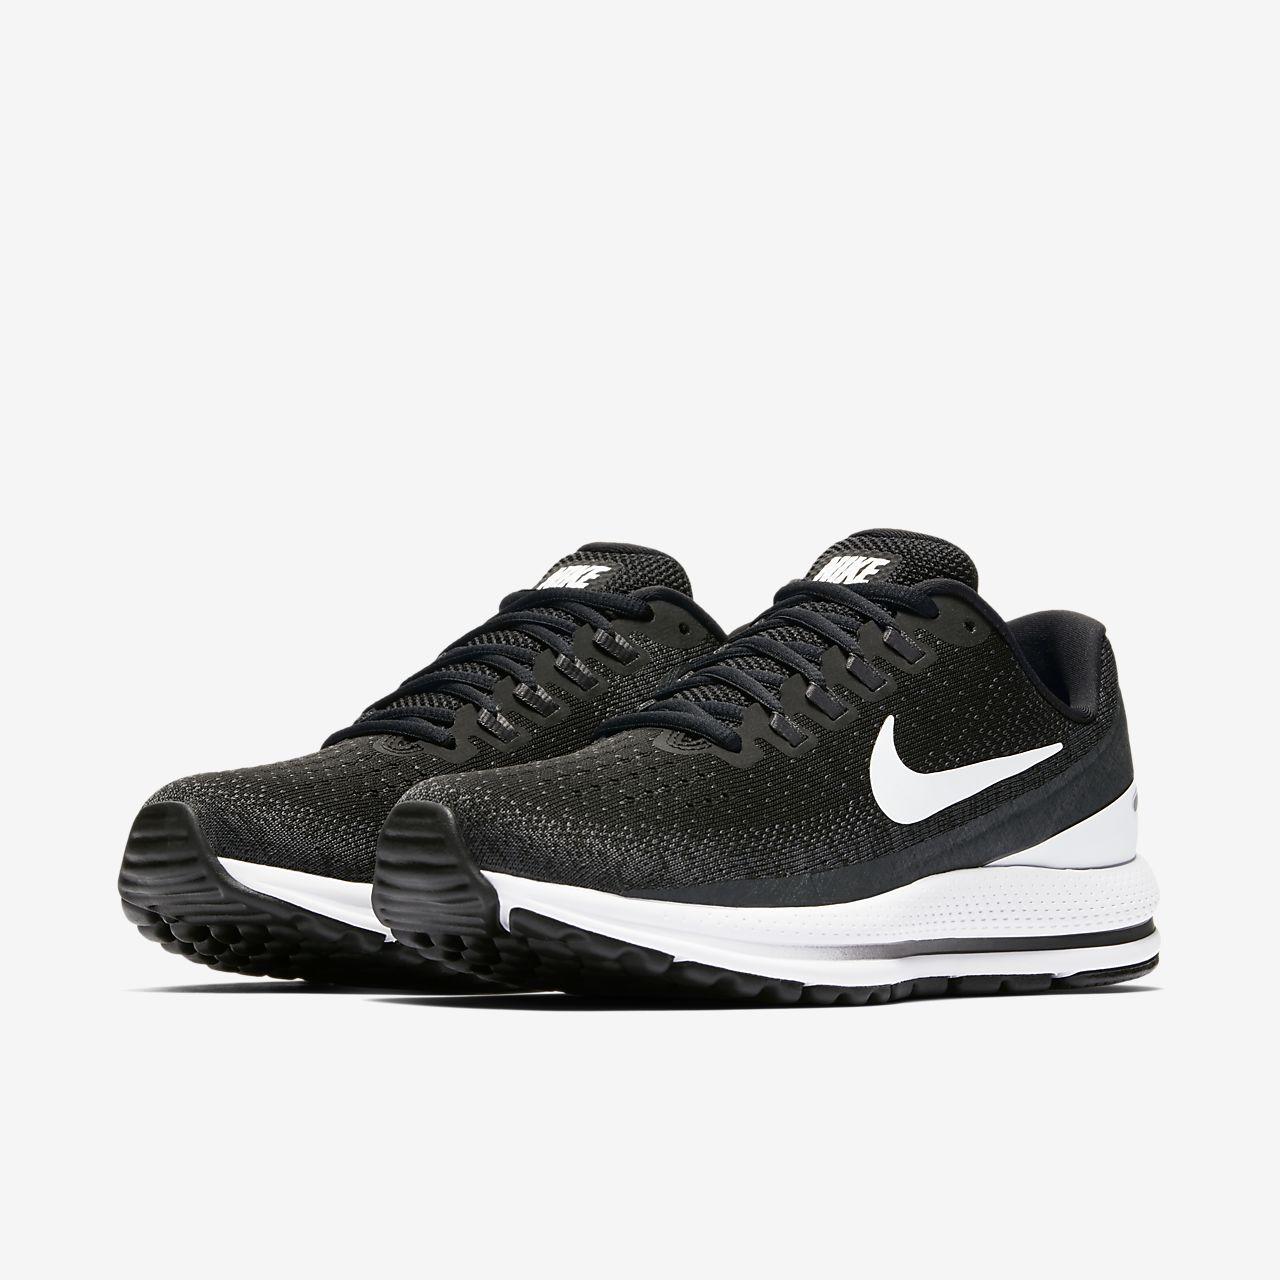 brand new 94039 c17b0 ... Chaussure de running Nike Air Zoom Vomero 13 pour Femme